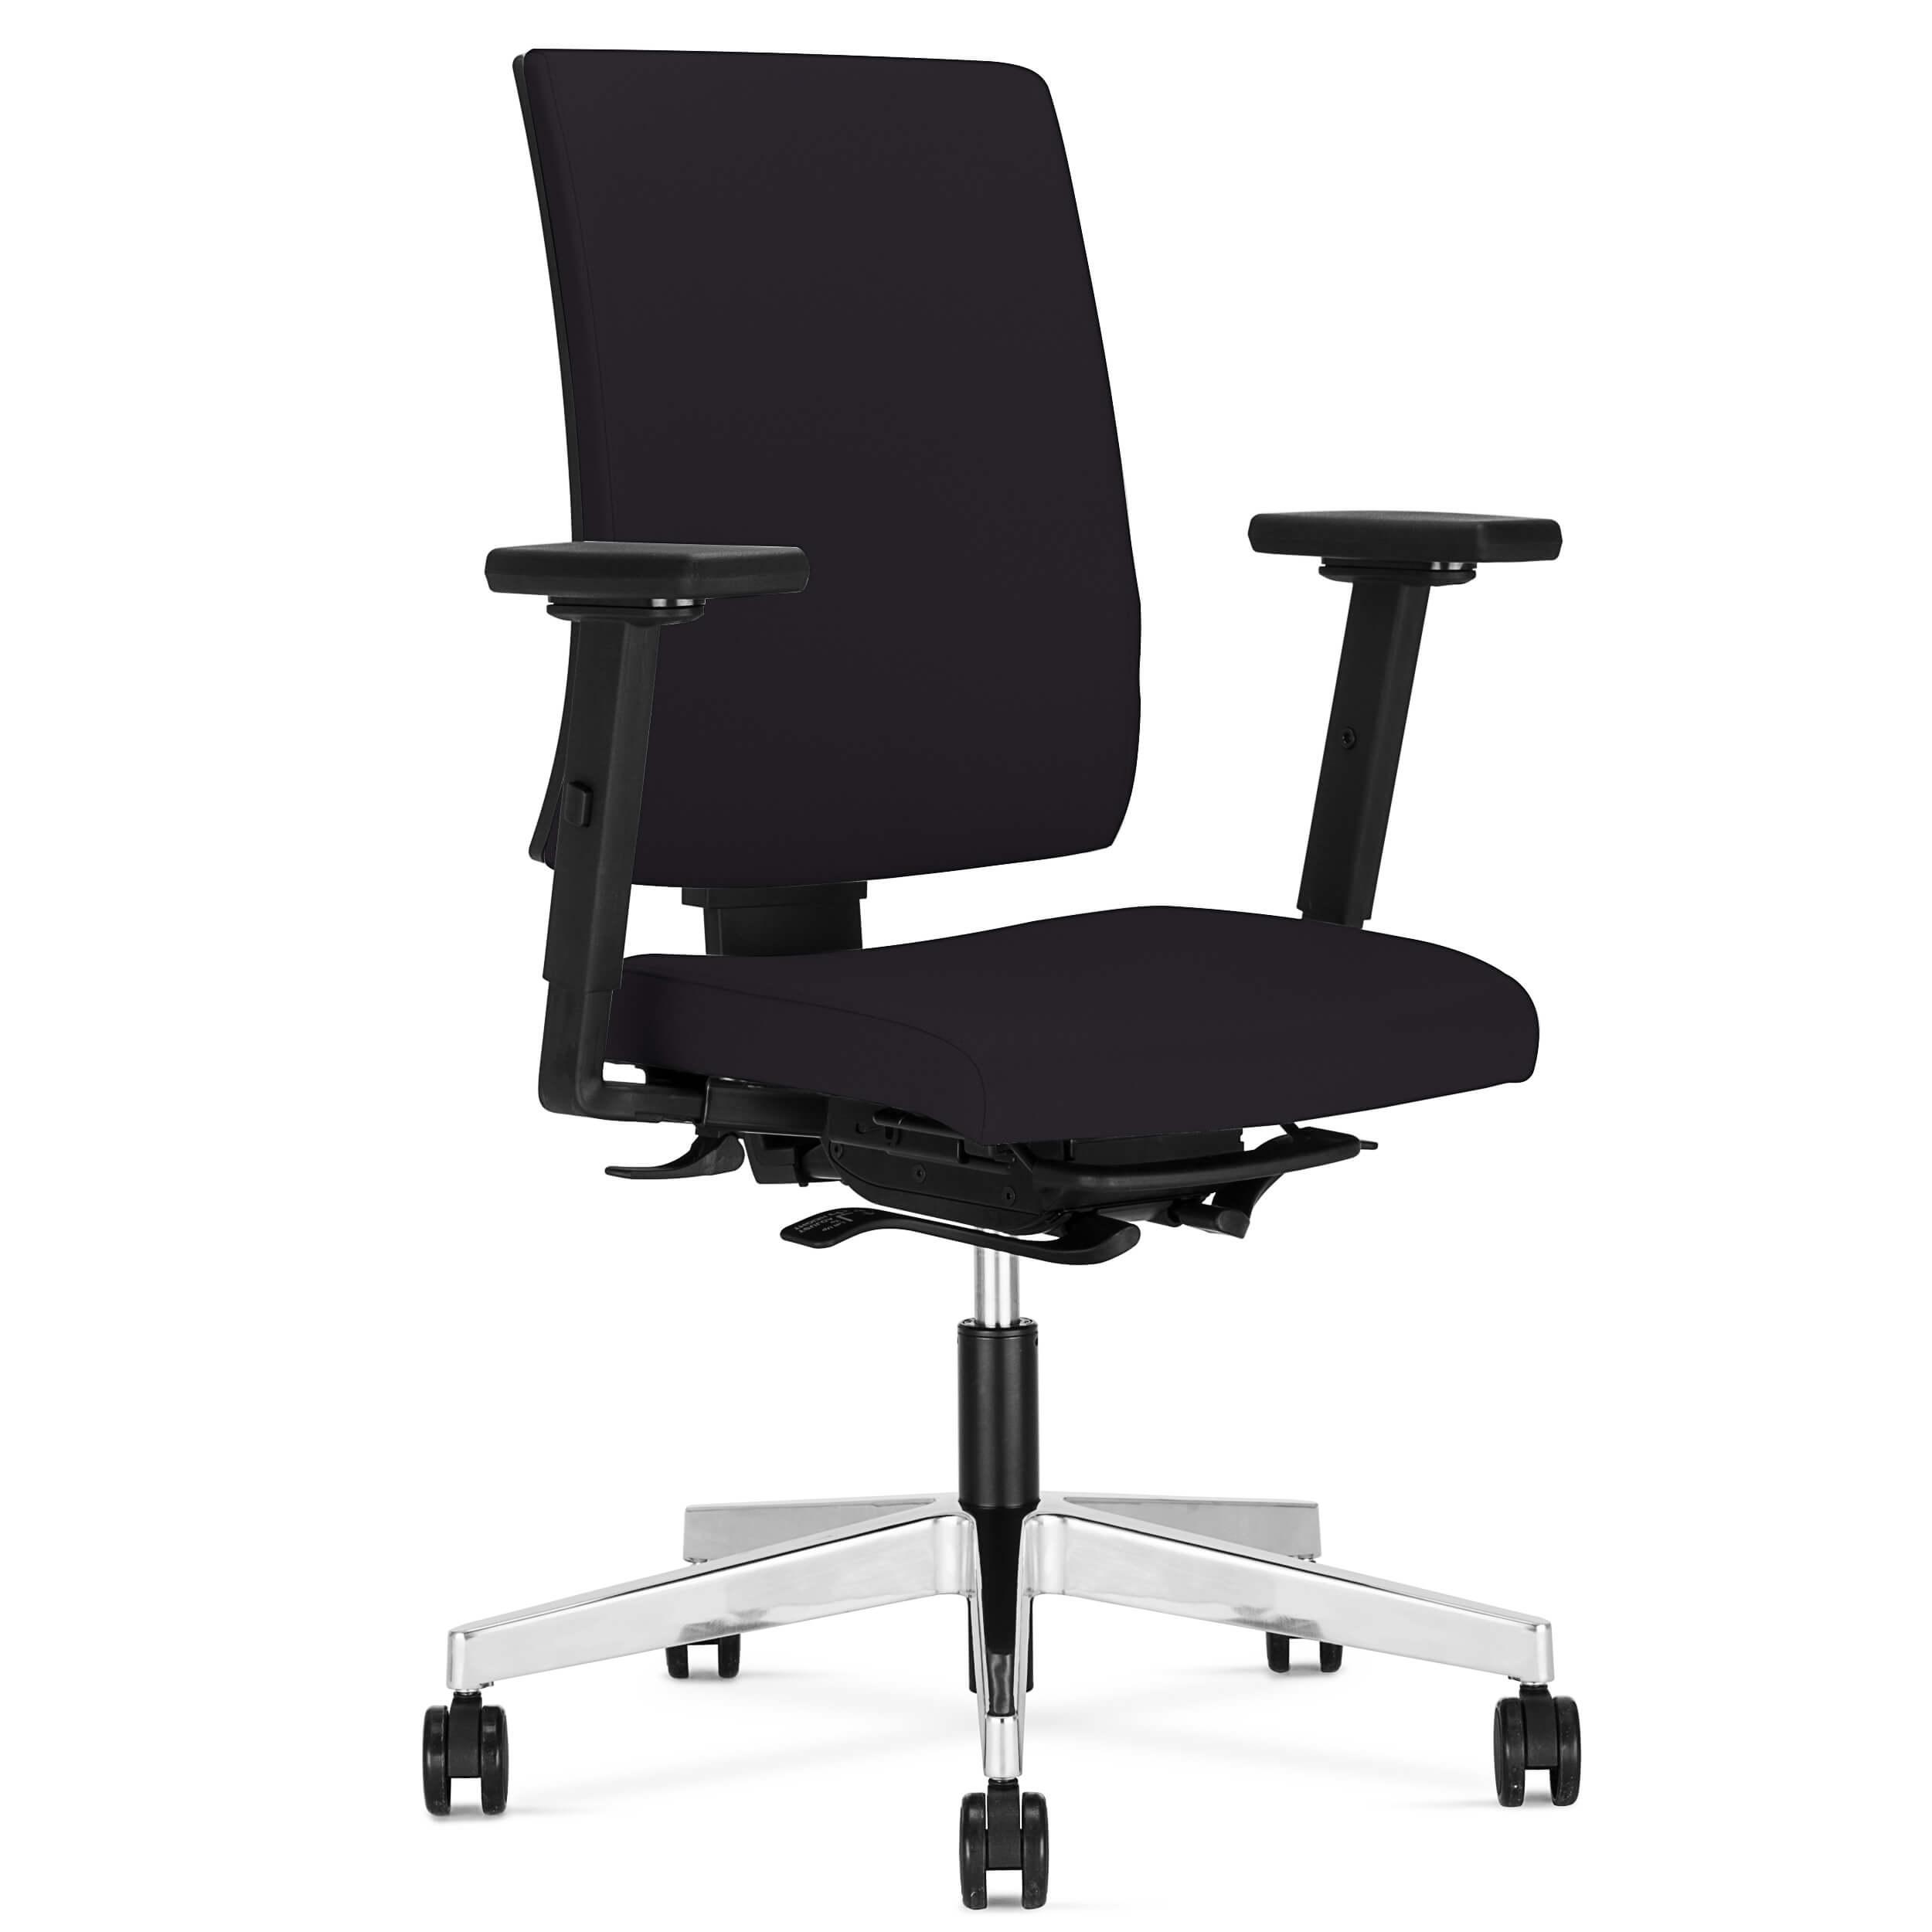 Drehstuhl Bürodrehstuhl Stuhl Bürostuhl Navigo